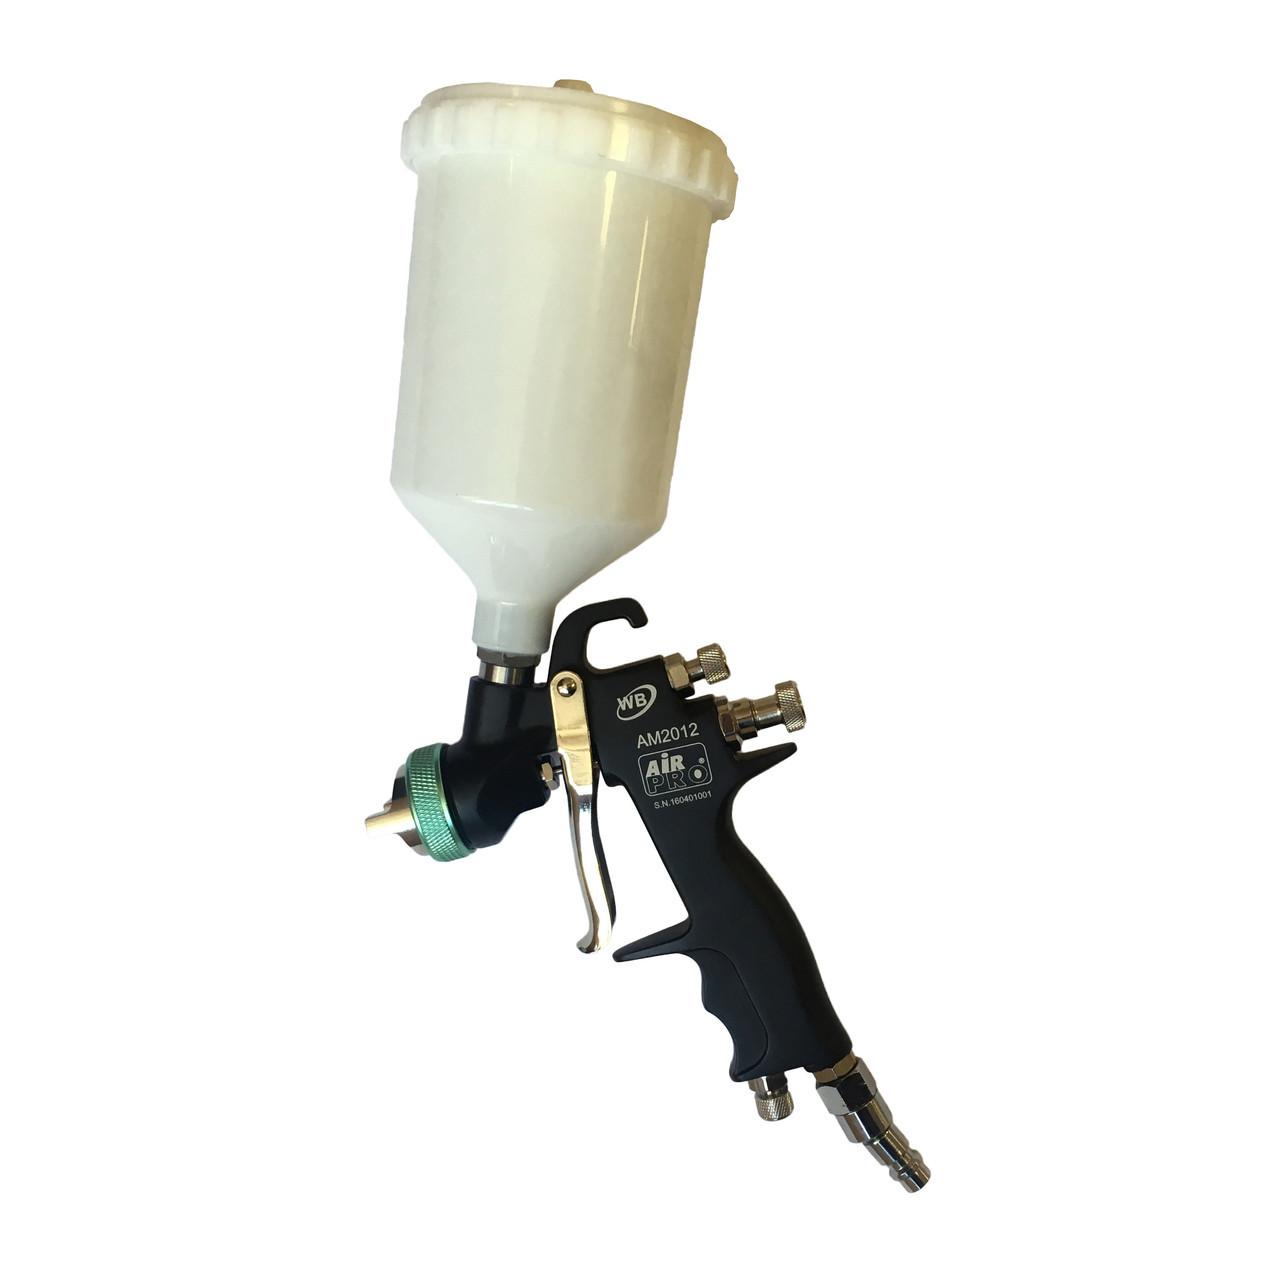 Краскопульт пневматический (1.6 мм) Air Pro AM2012 HVLP WB-1.6 (Тайвань)